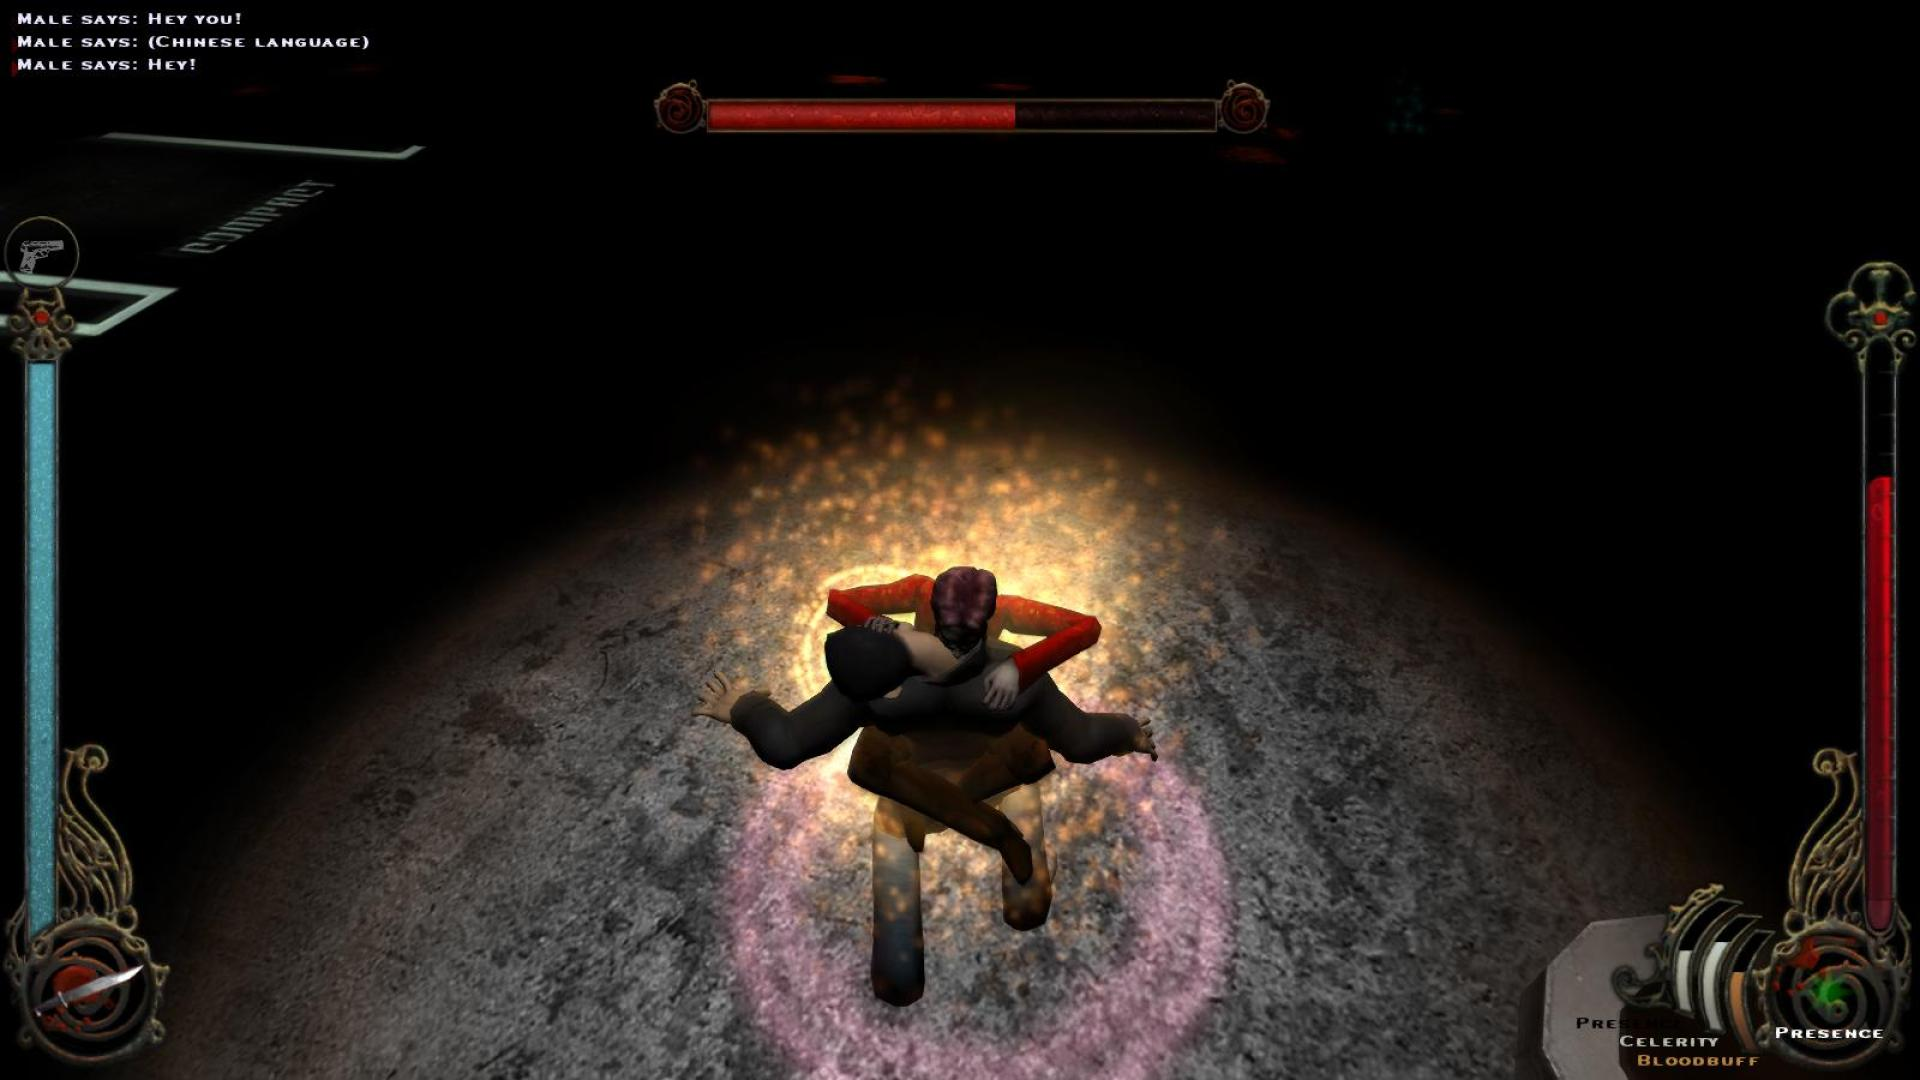 Vampire: The Masquerade - Bloodlines (2004) 7. kép